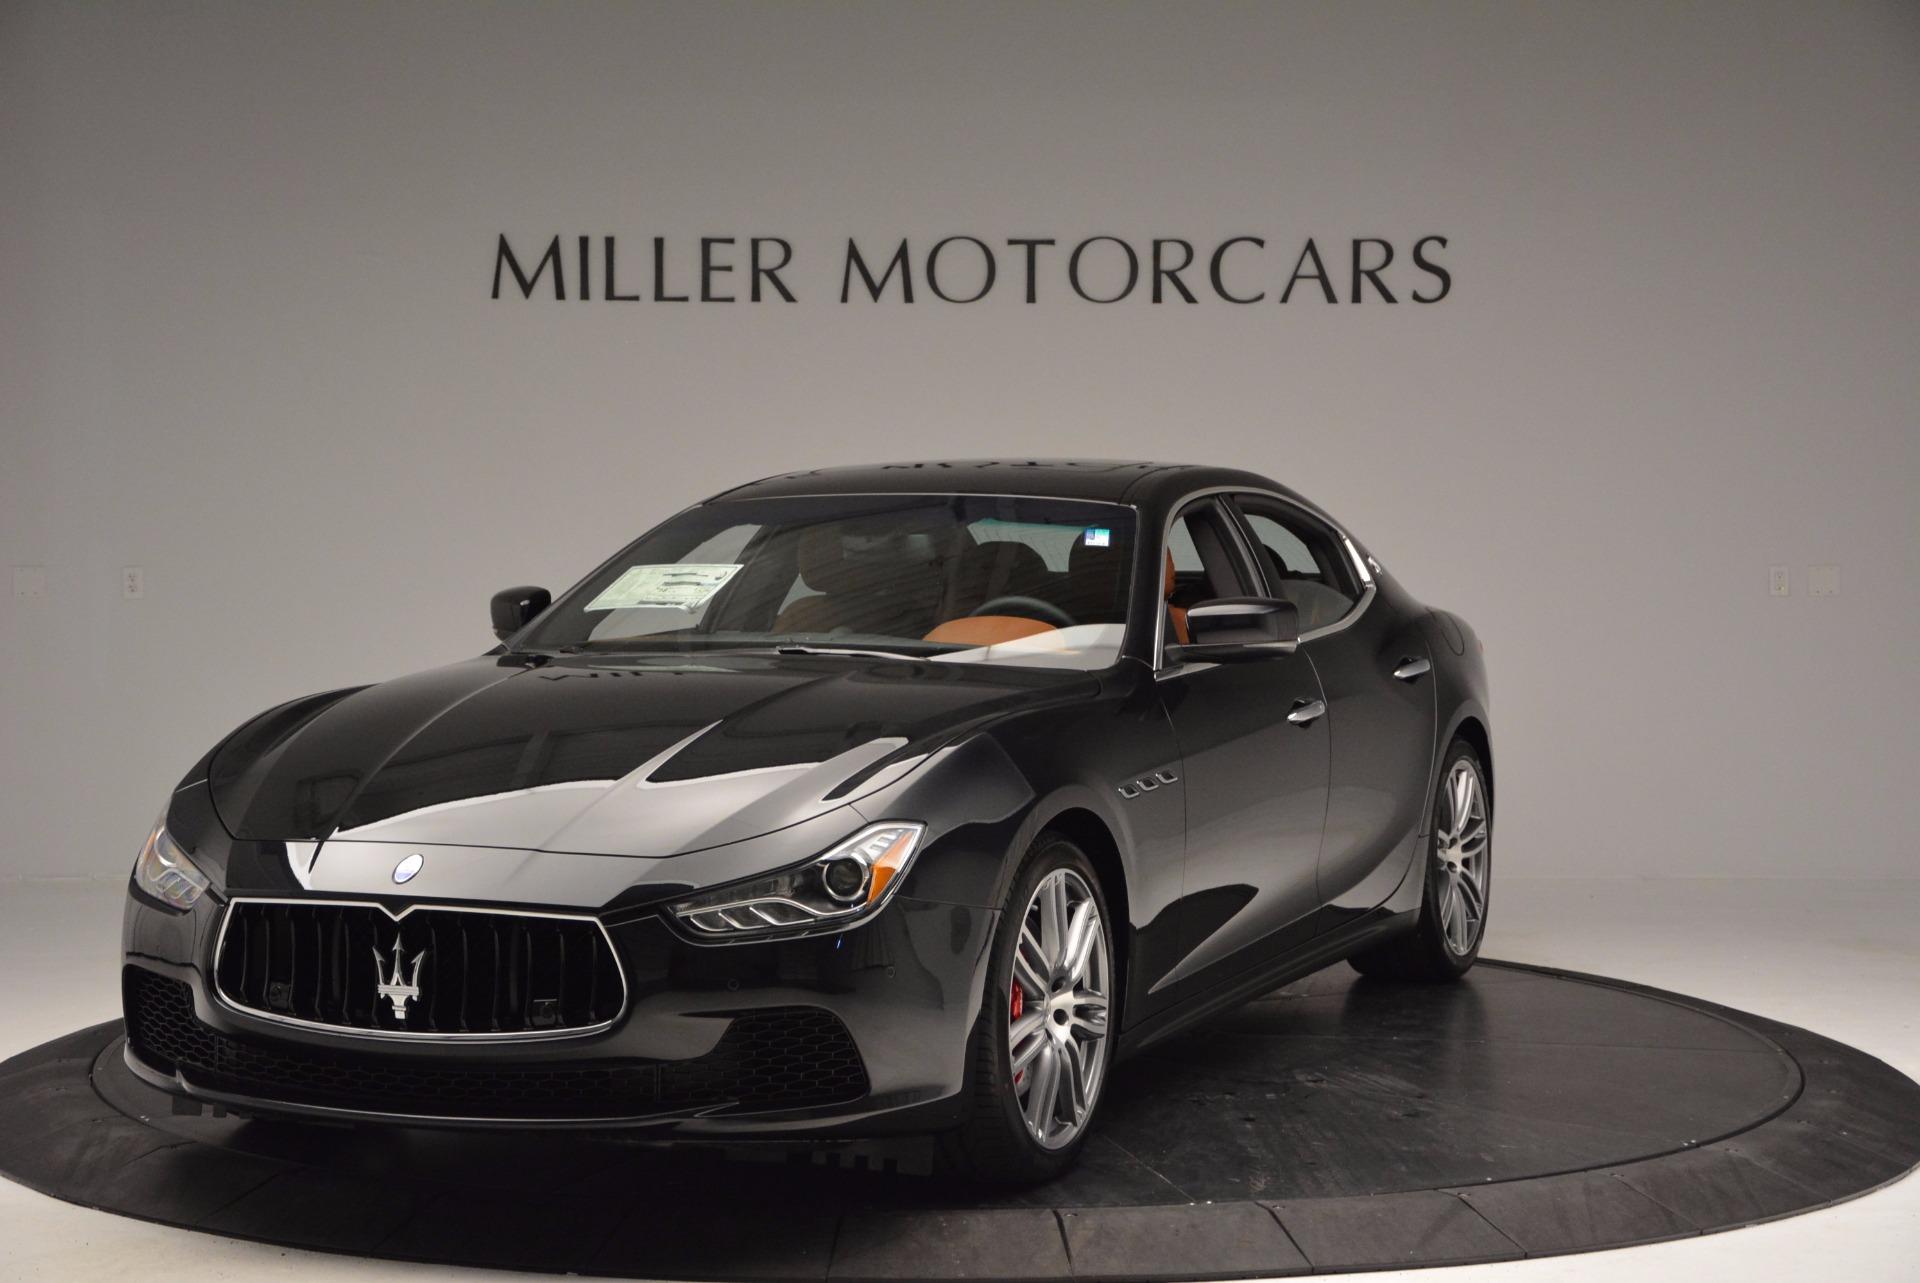 Used 2014 Maserati Ghibli S Q4 For Sale In Greenwich, CT. Alfa Romeo of Greenwich, 7249 1459_main